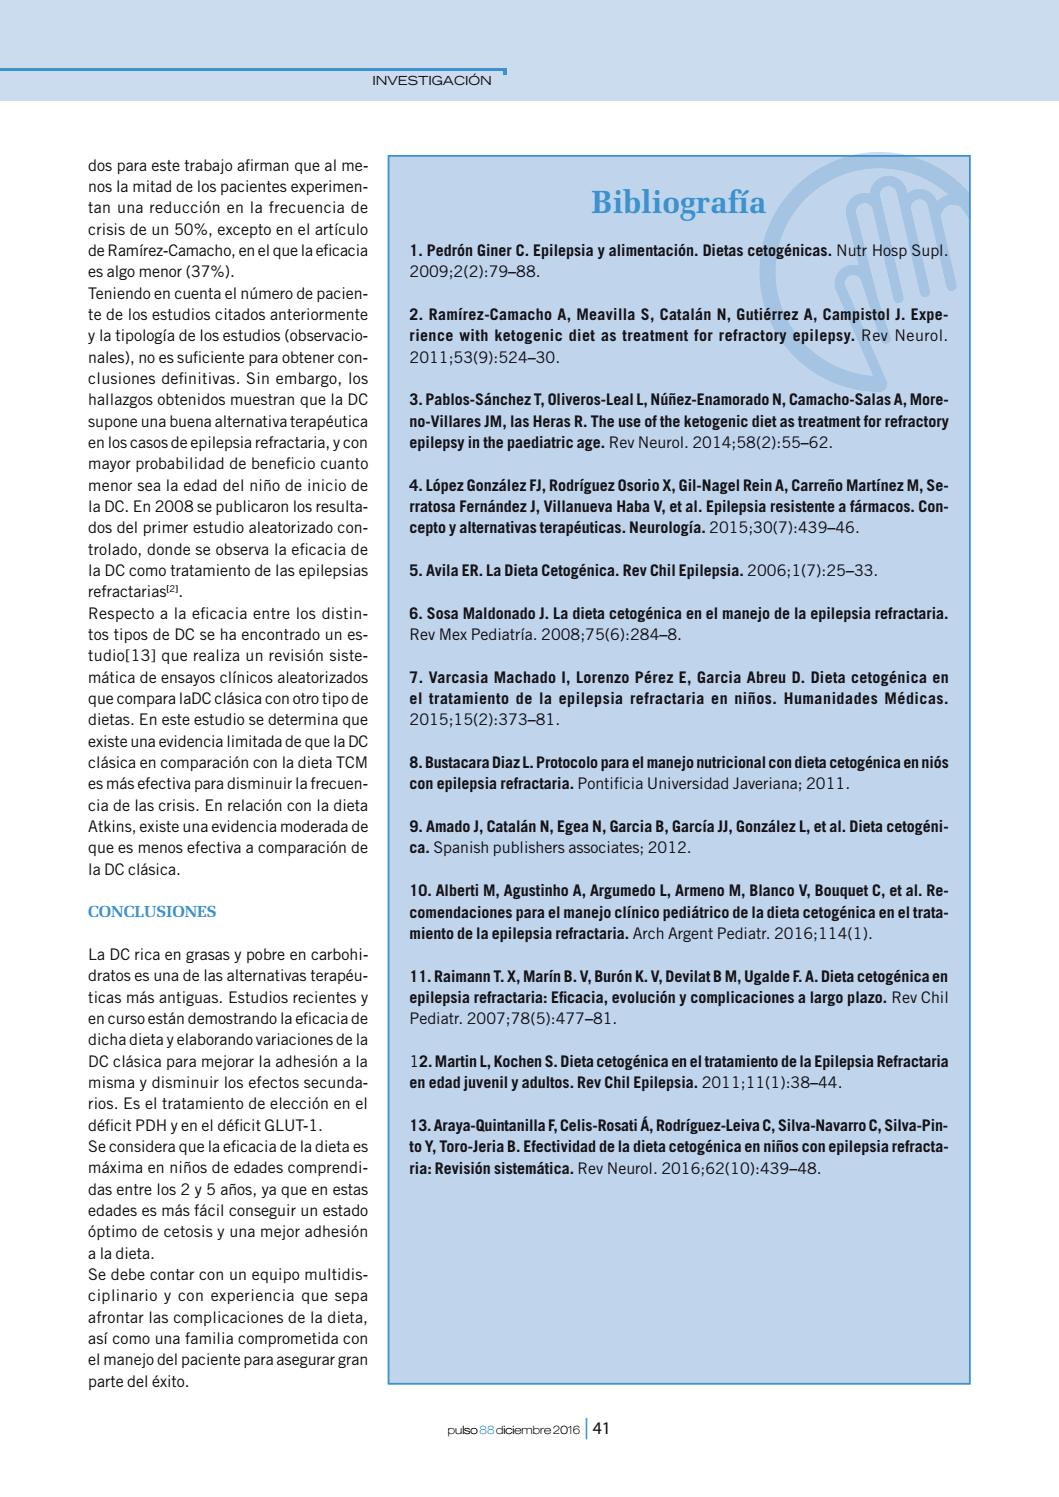 dieta cetogenica epilepsia adultos